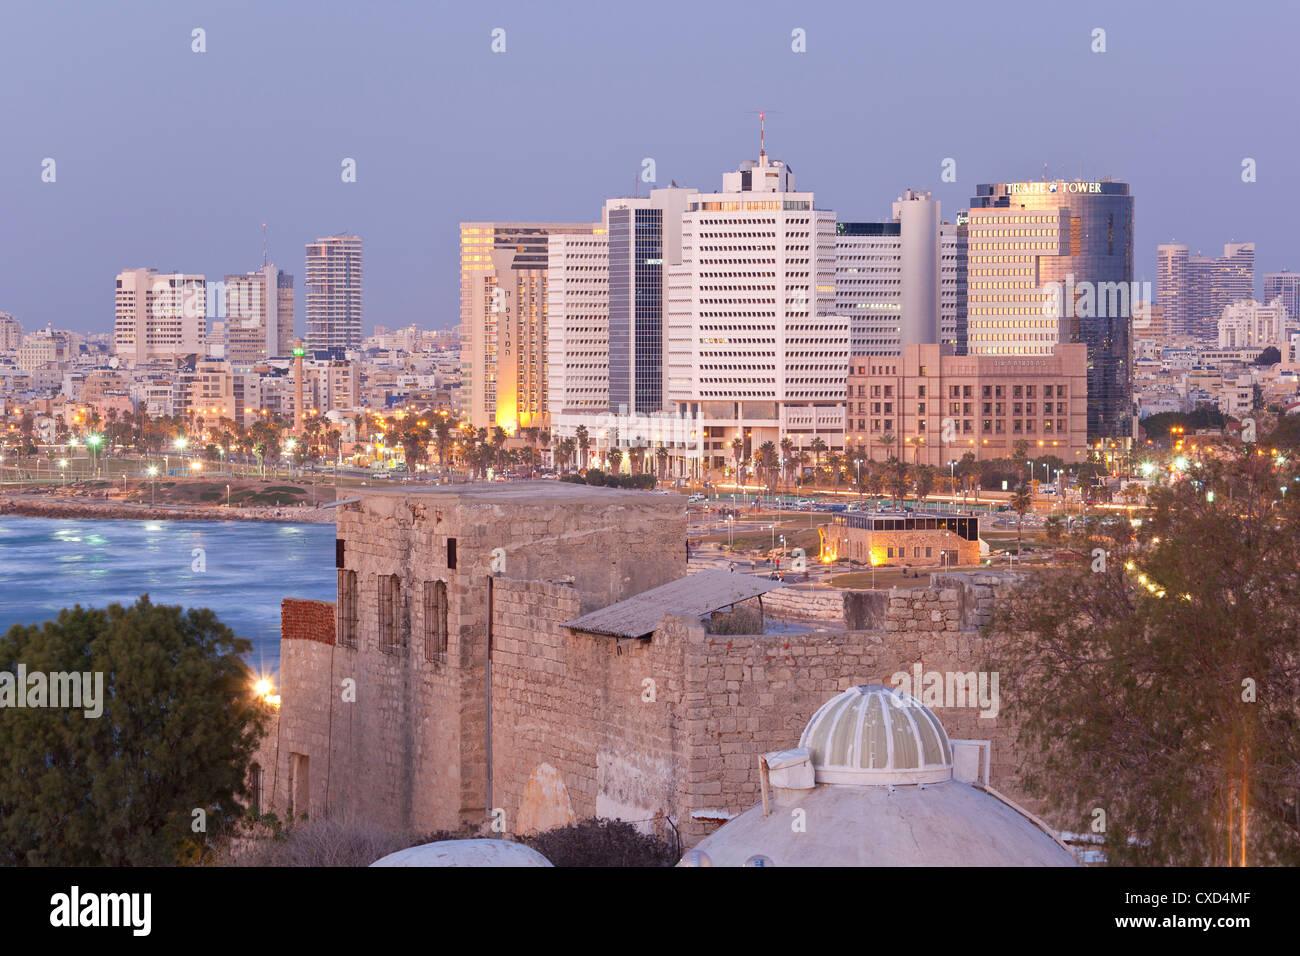 Downtown buildings viewed from HaPisgah Gardens Park, Tel Aviv, Israel, Middle East - Stock Image